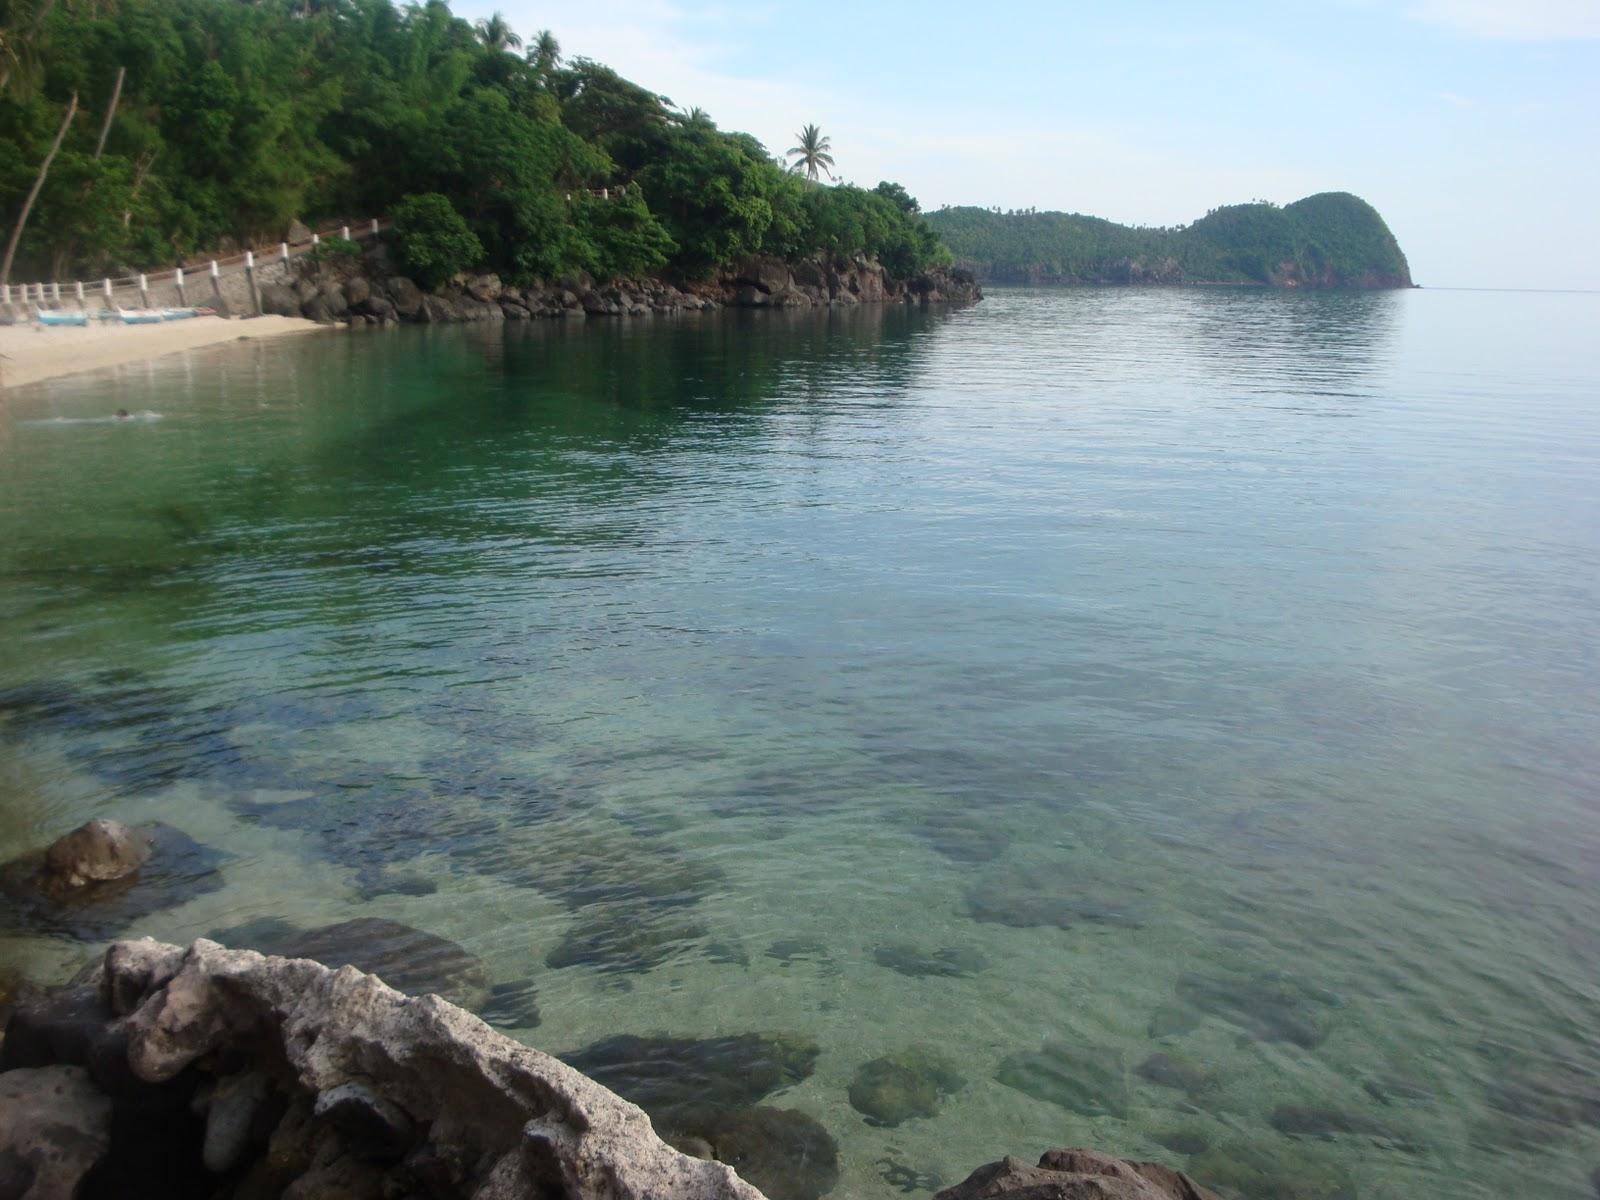 Macat-Ang Beach Banton Island, Barangay Mainit Beach, Macat-ang_Banton-Island, Macat-ang Beach